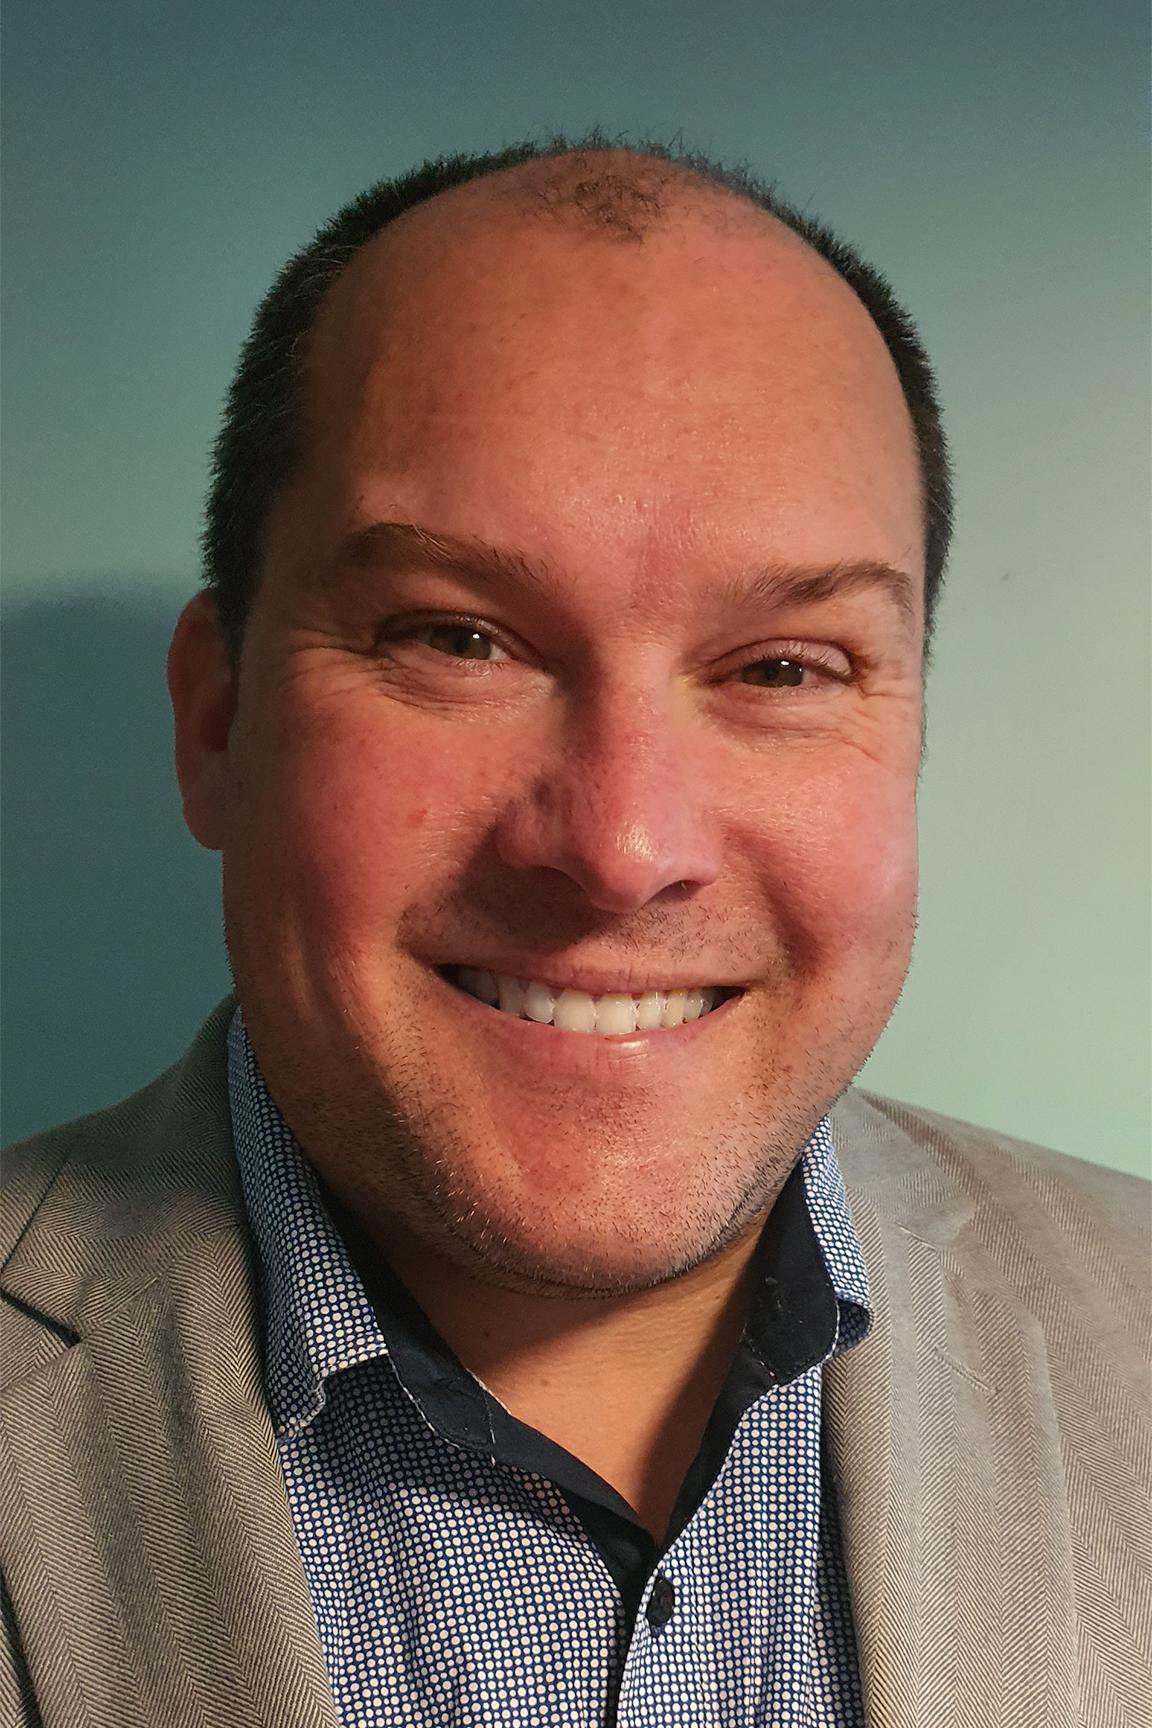 Grae O'Sullivan | ACT Candidate for Remutaka